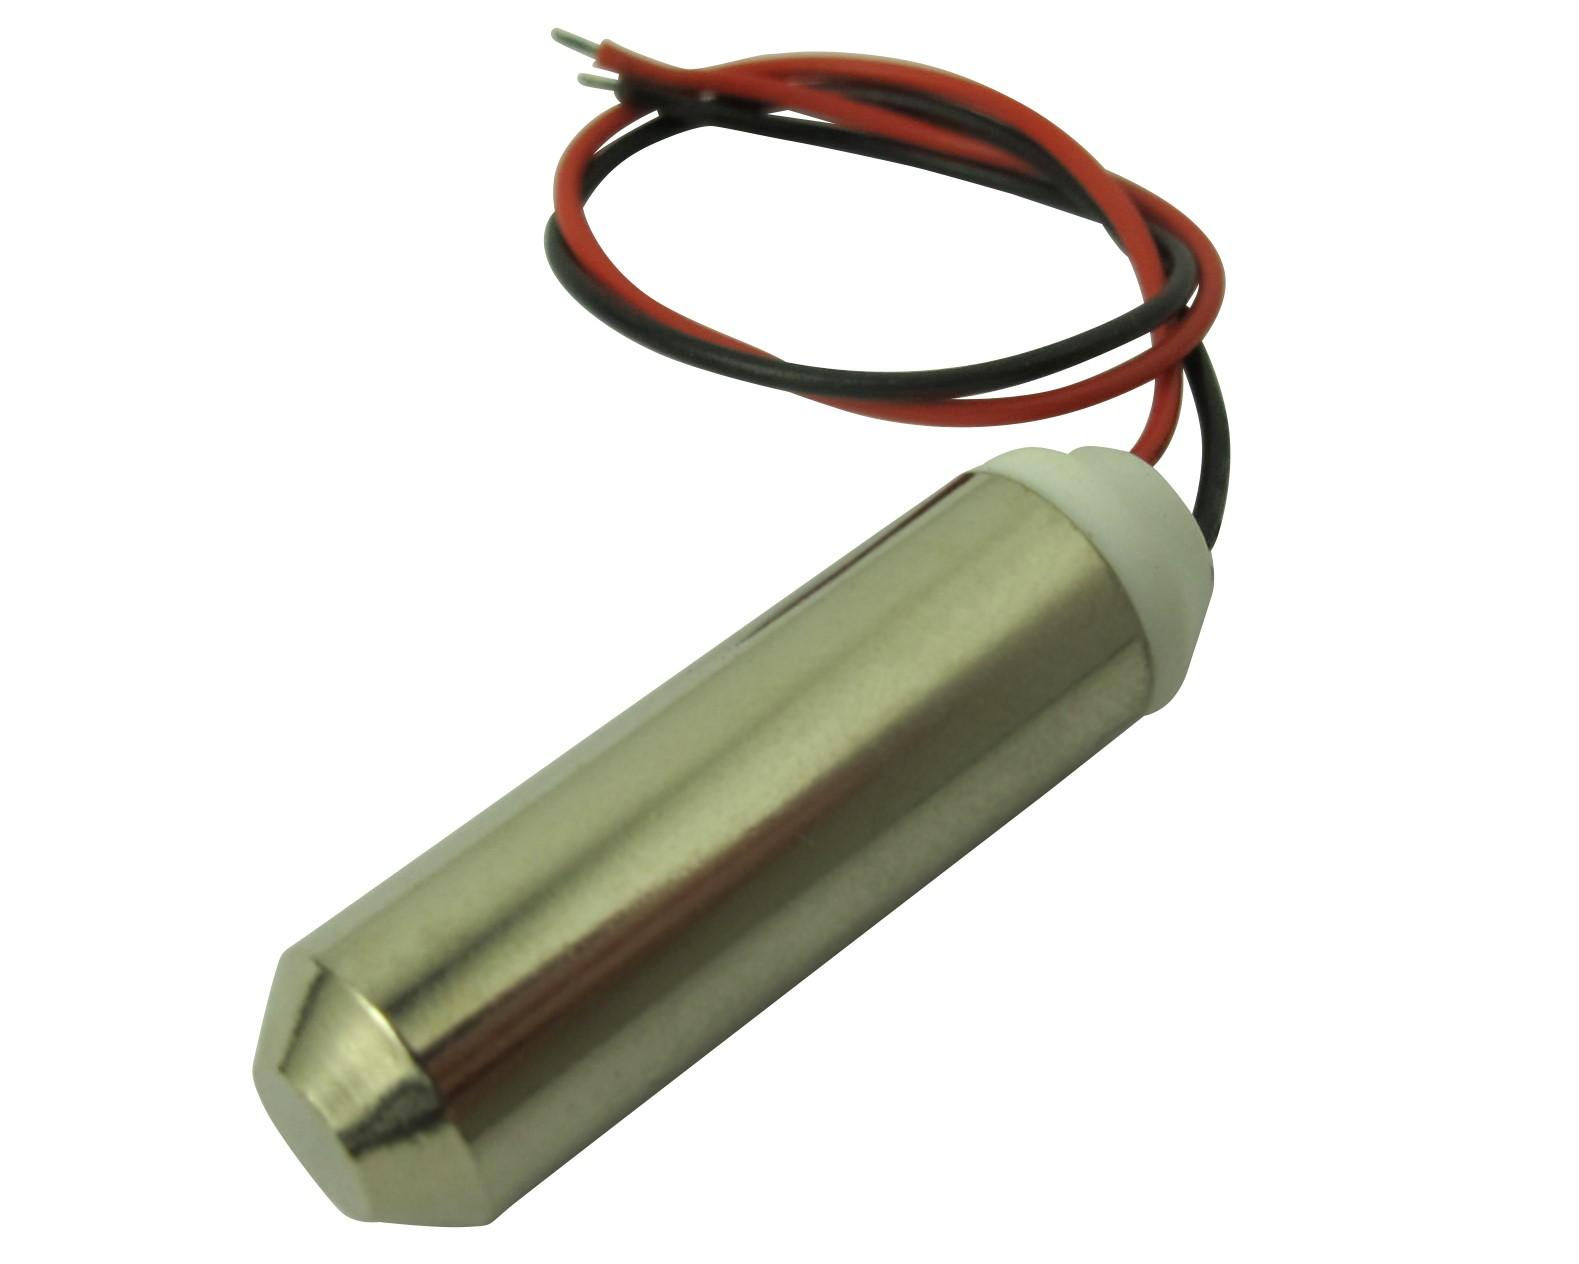 Z6DL2A0765217 Cylindrical Vibrator Motor